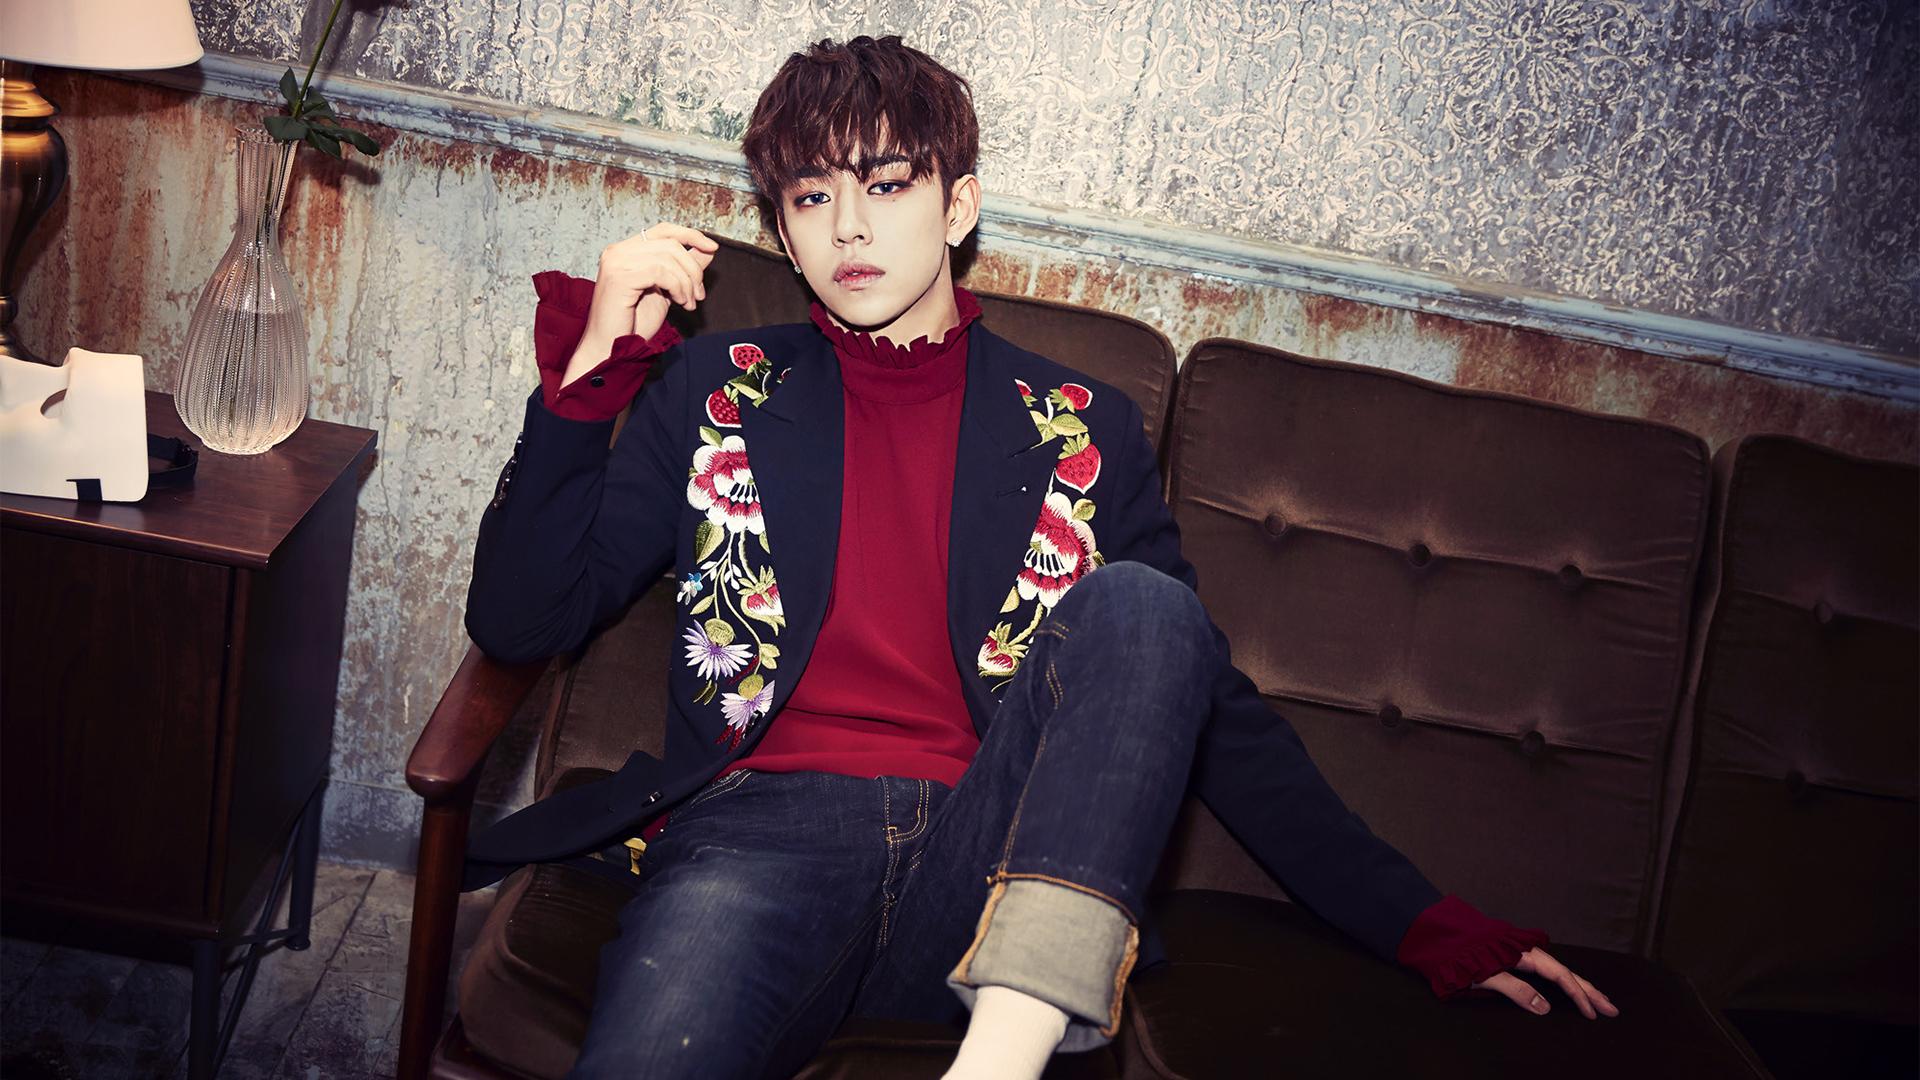 B-A-P-JungDaehyun-Daehyun-wallpaper-wp34012041